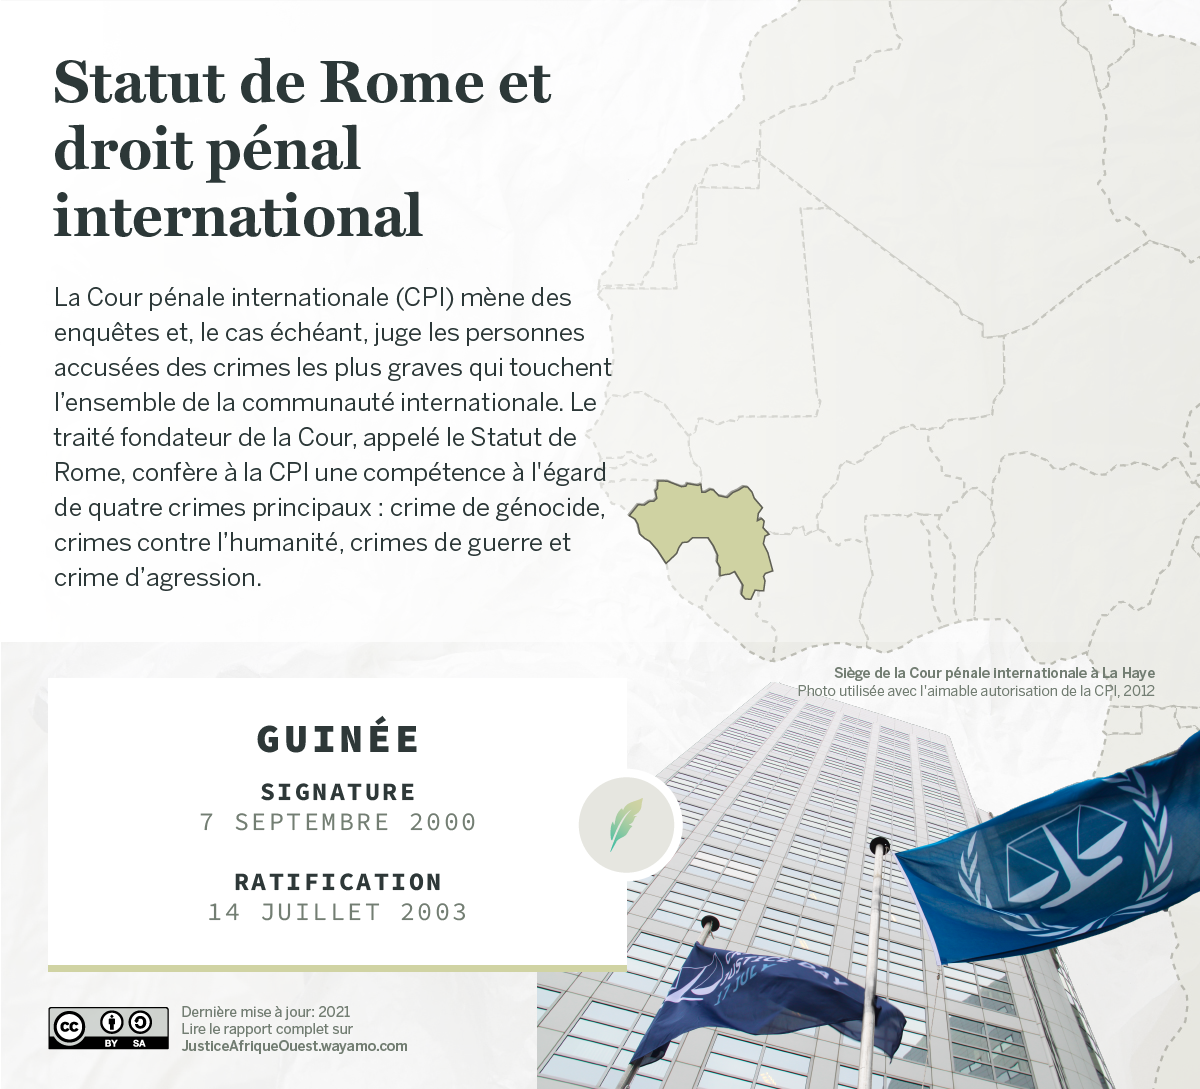 GUINEE_Statut de Rome - Wayamo Foundation (CC BY-SA 4.0)